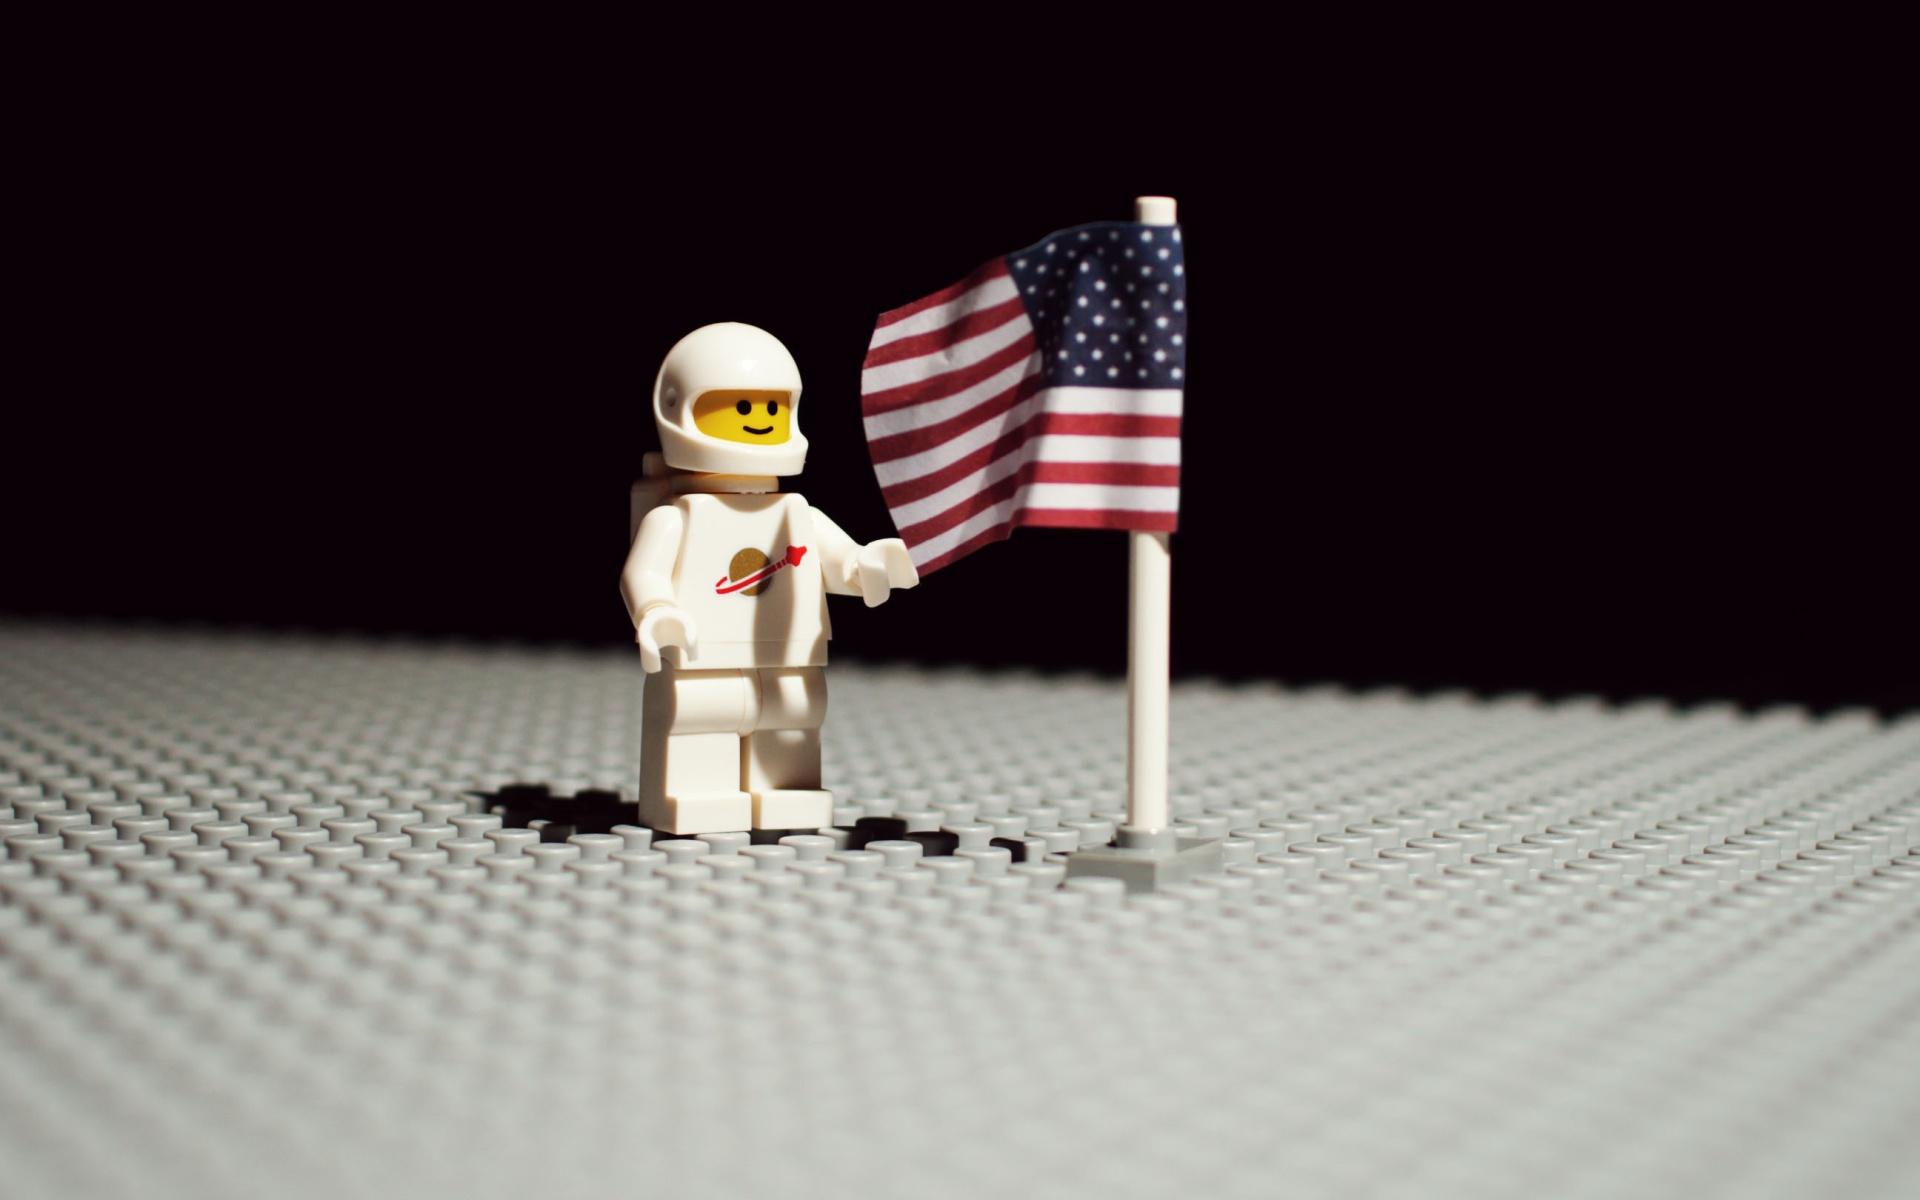 Lego Wallpaper 6530 1920x1200 px HDWallSourcecom